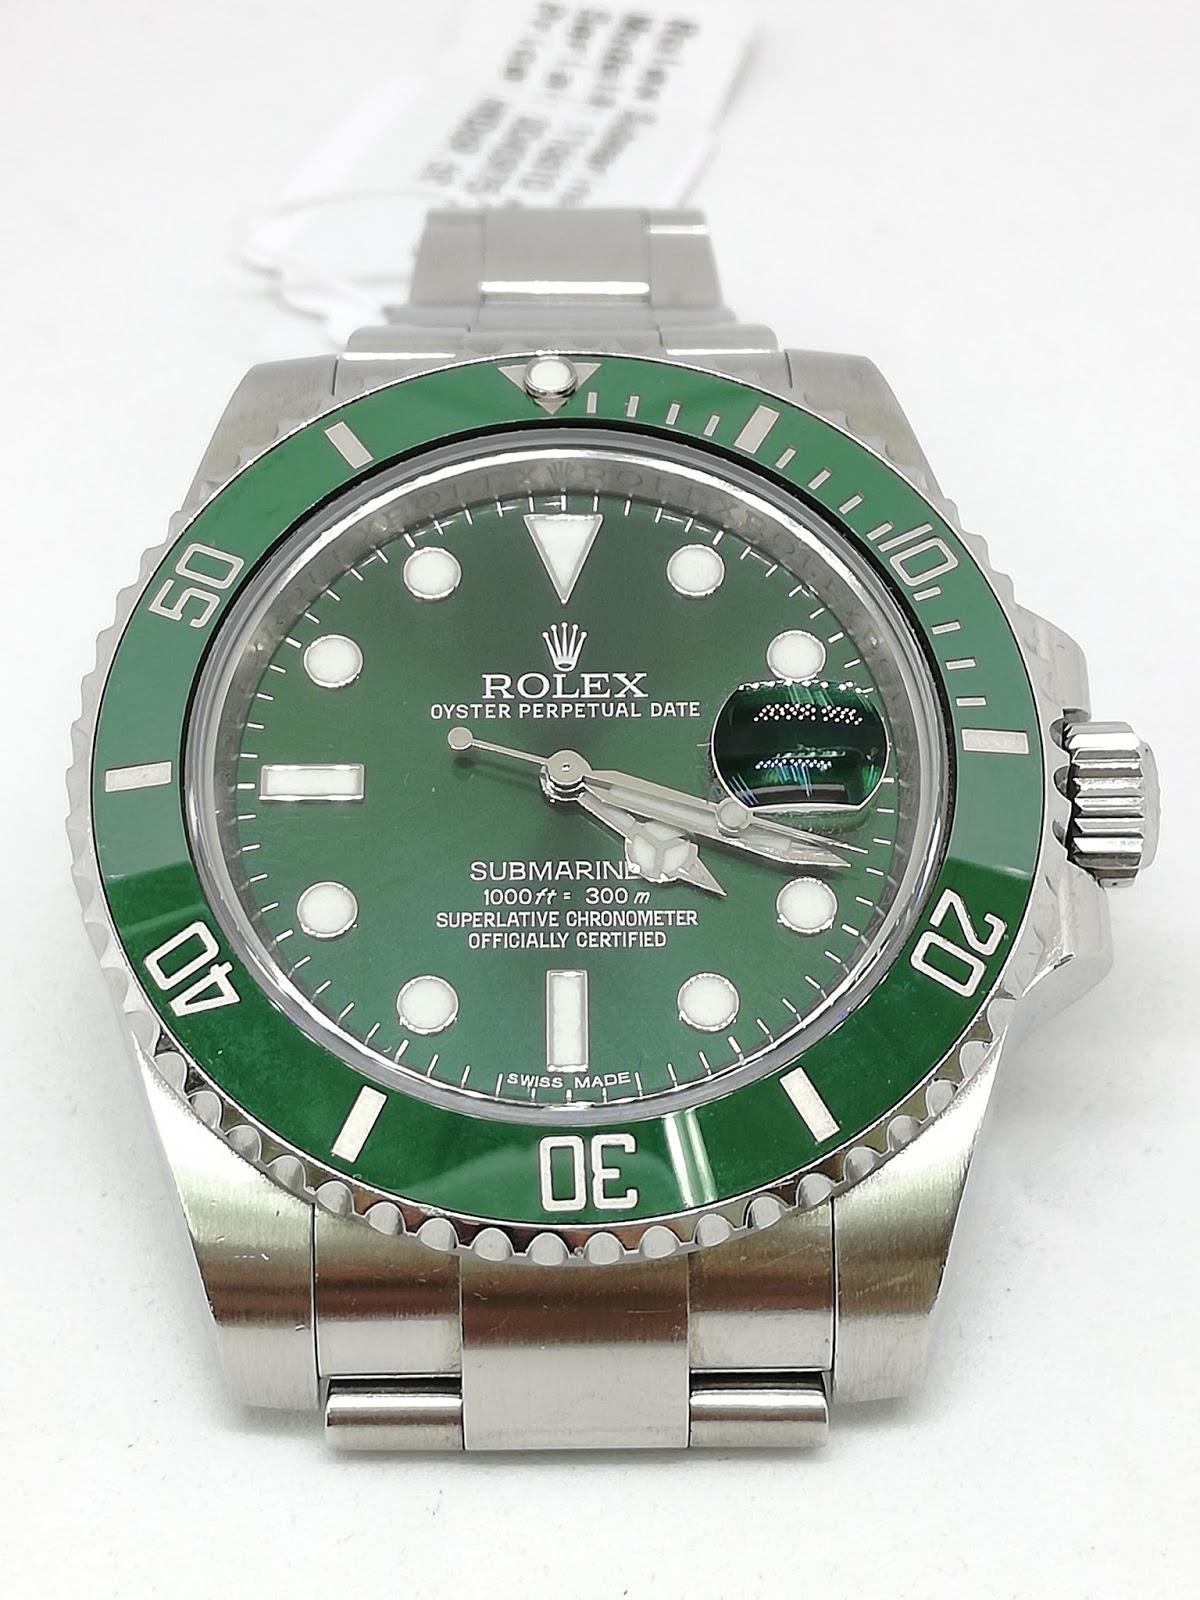 bf3cd4bf233 Hong Kong Watch Fever 香港勞友  Rolex Submariner ref 116610LV